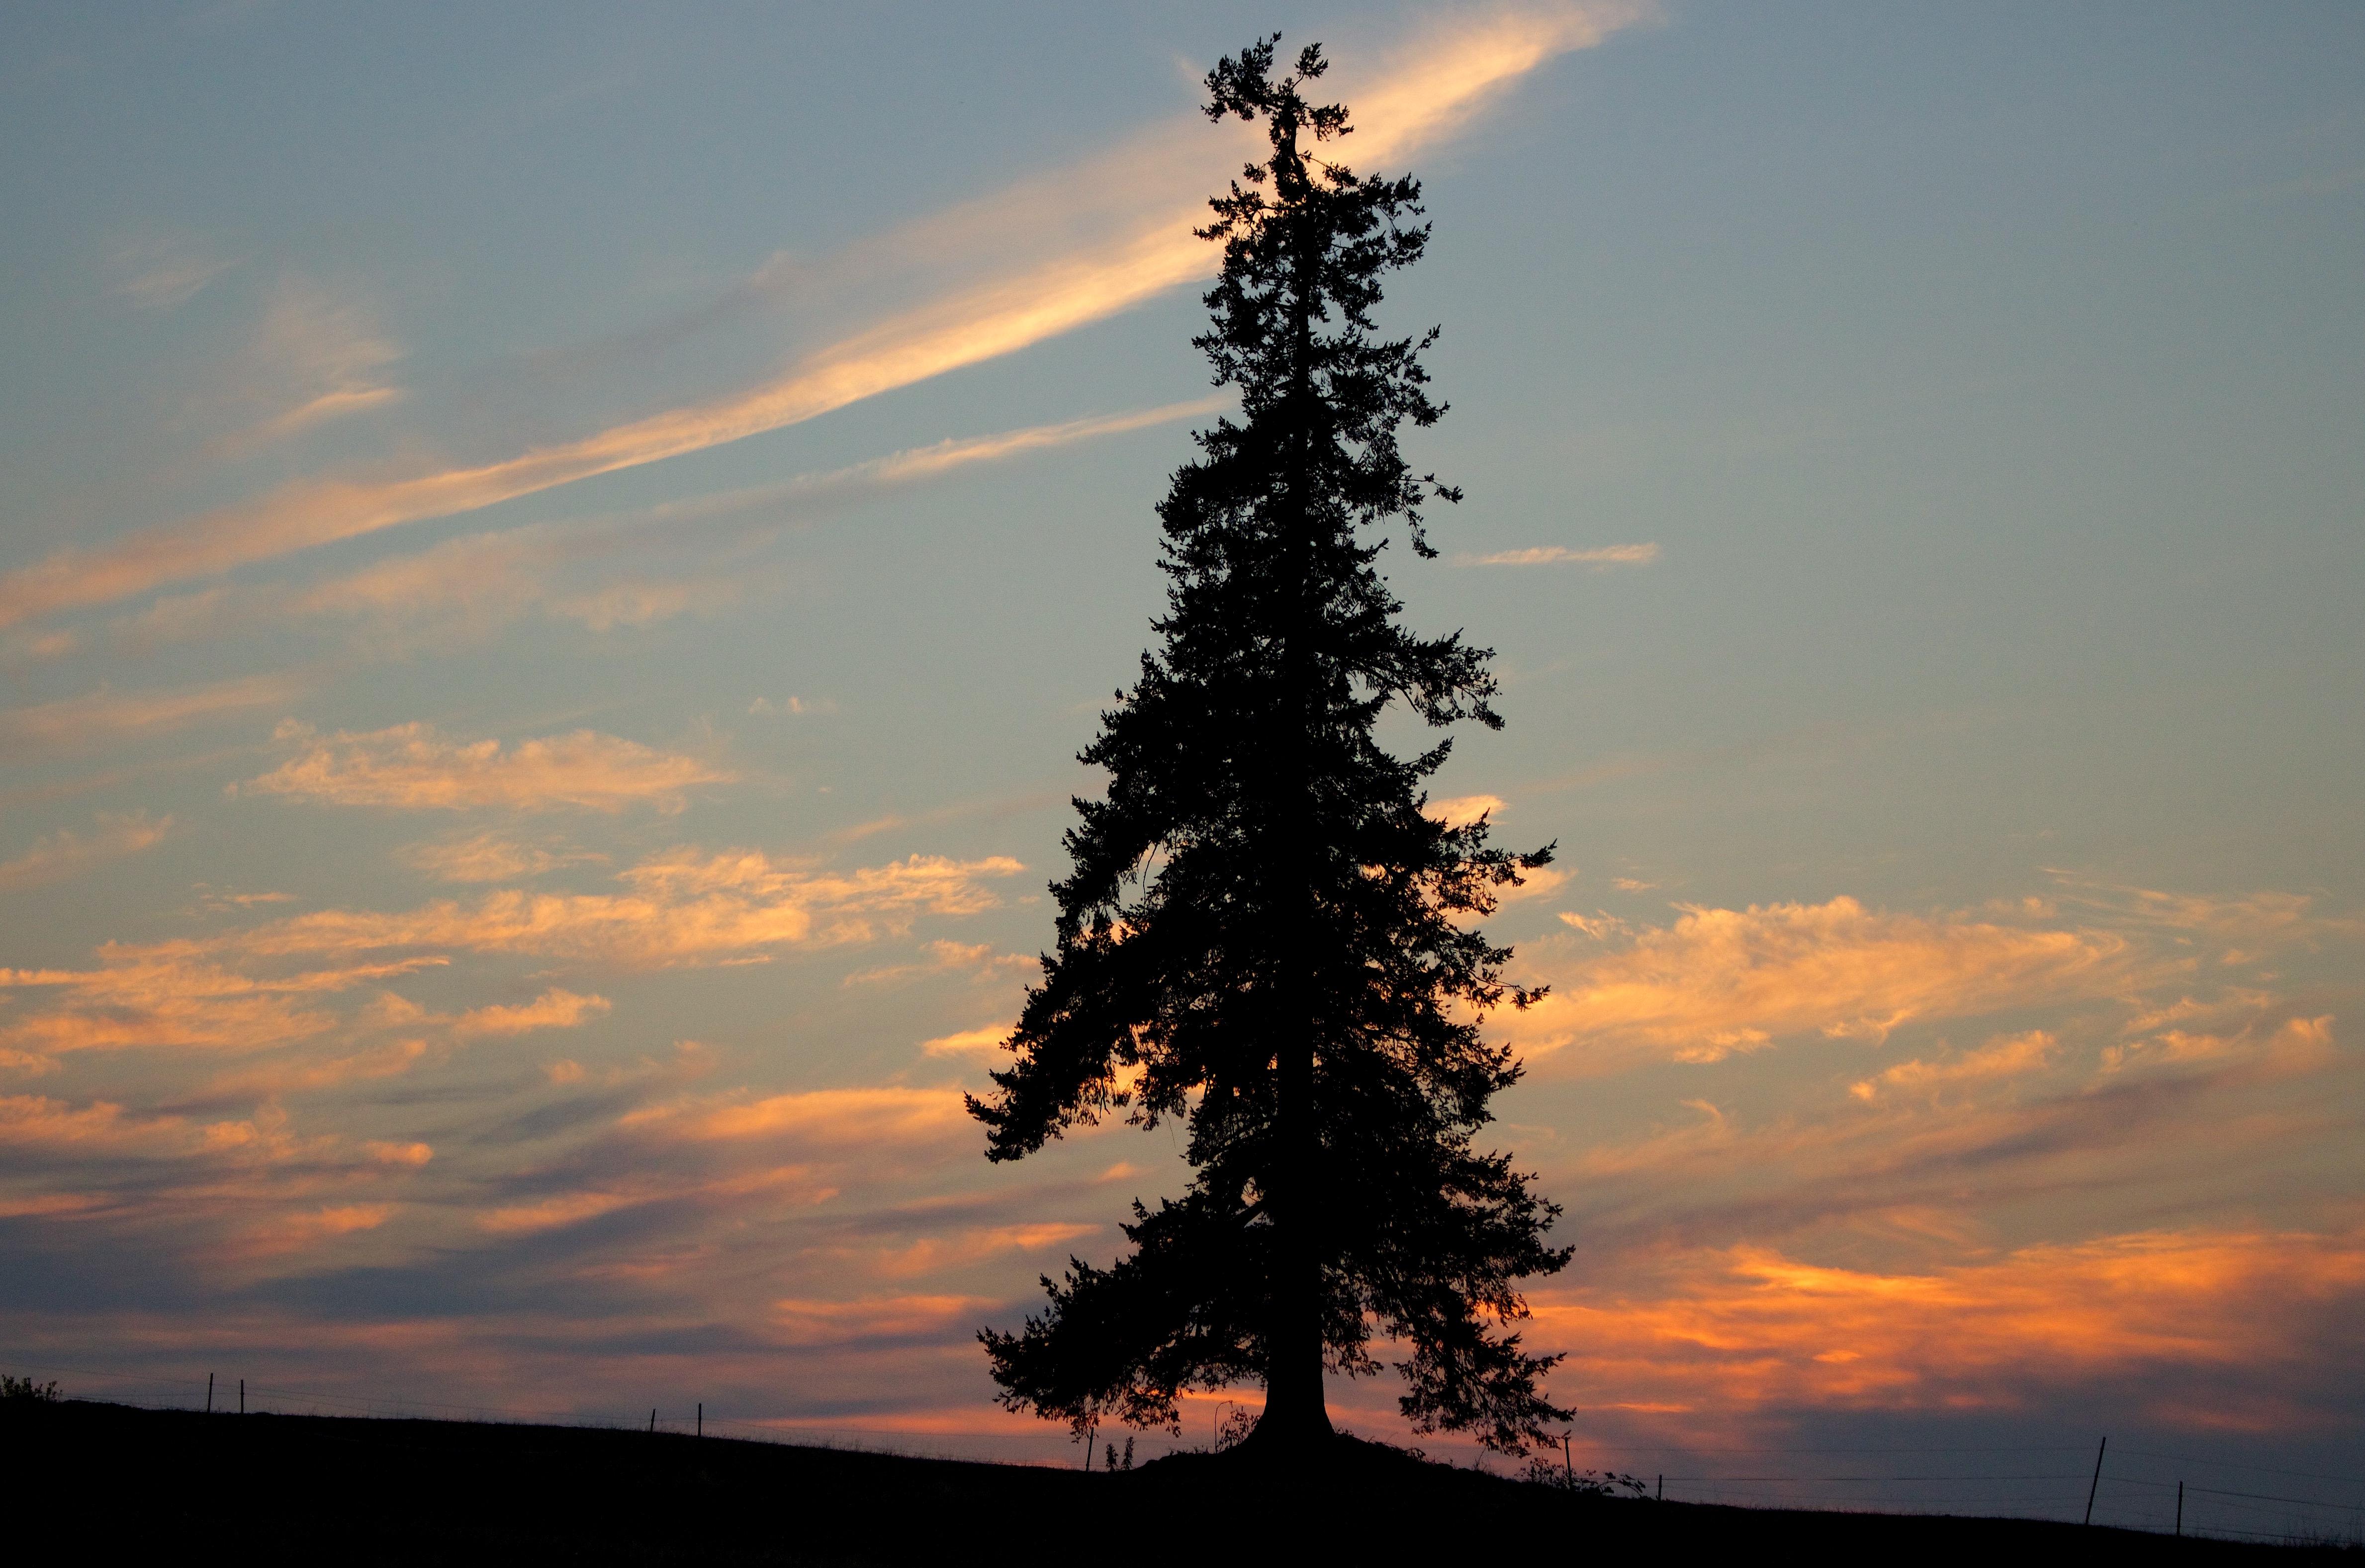 sunset813151